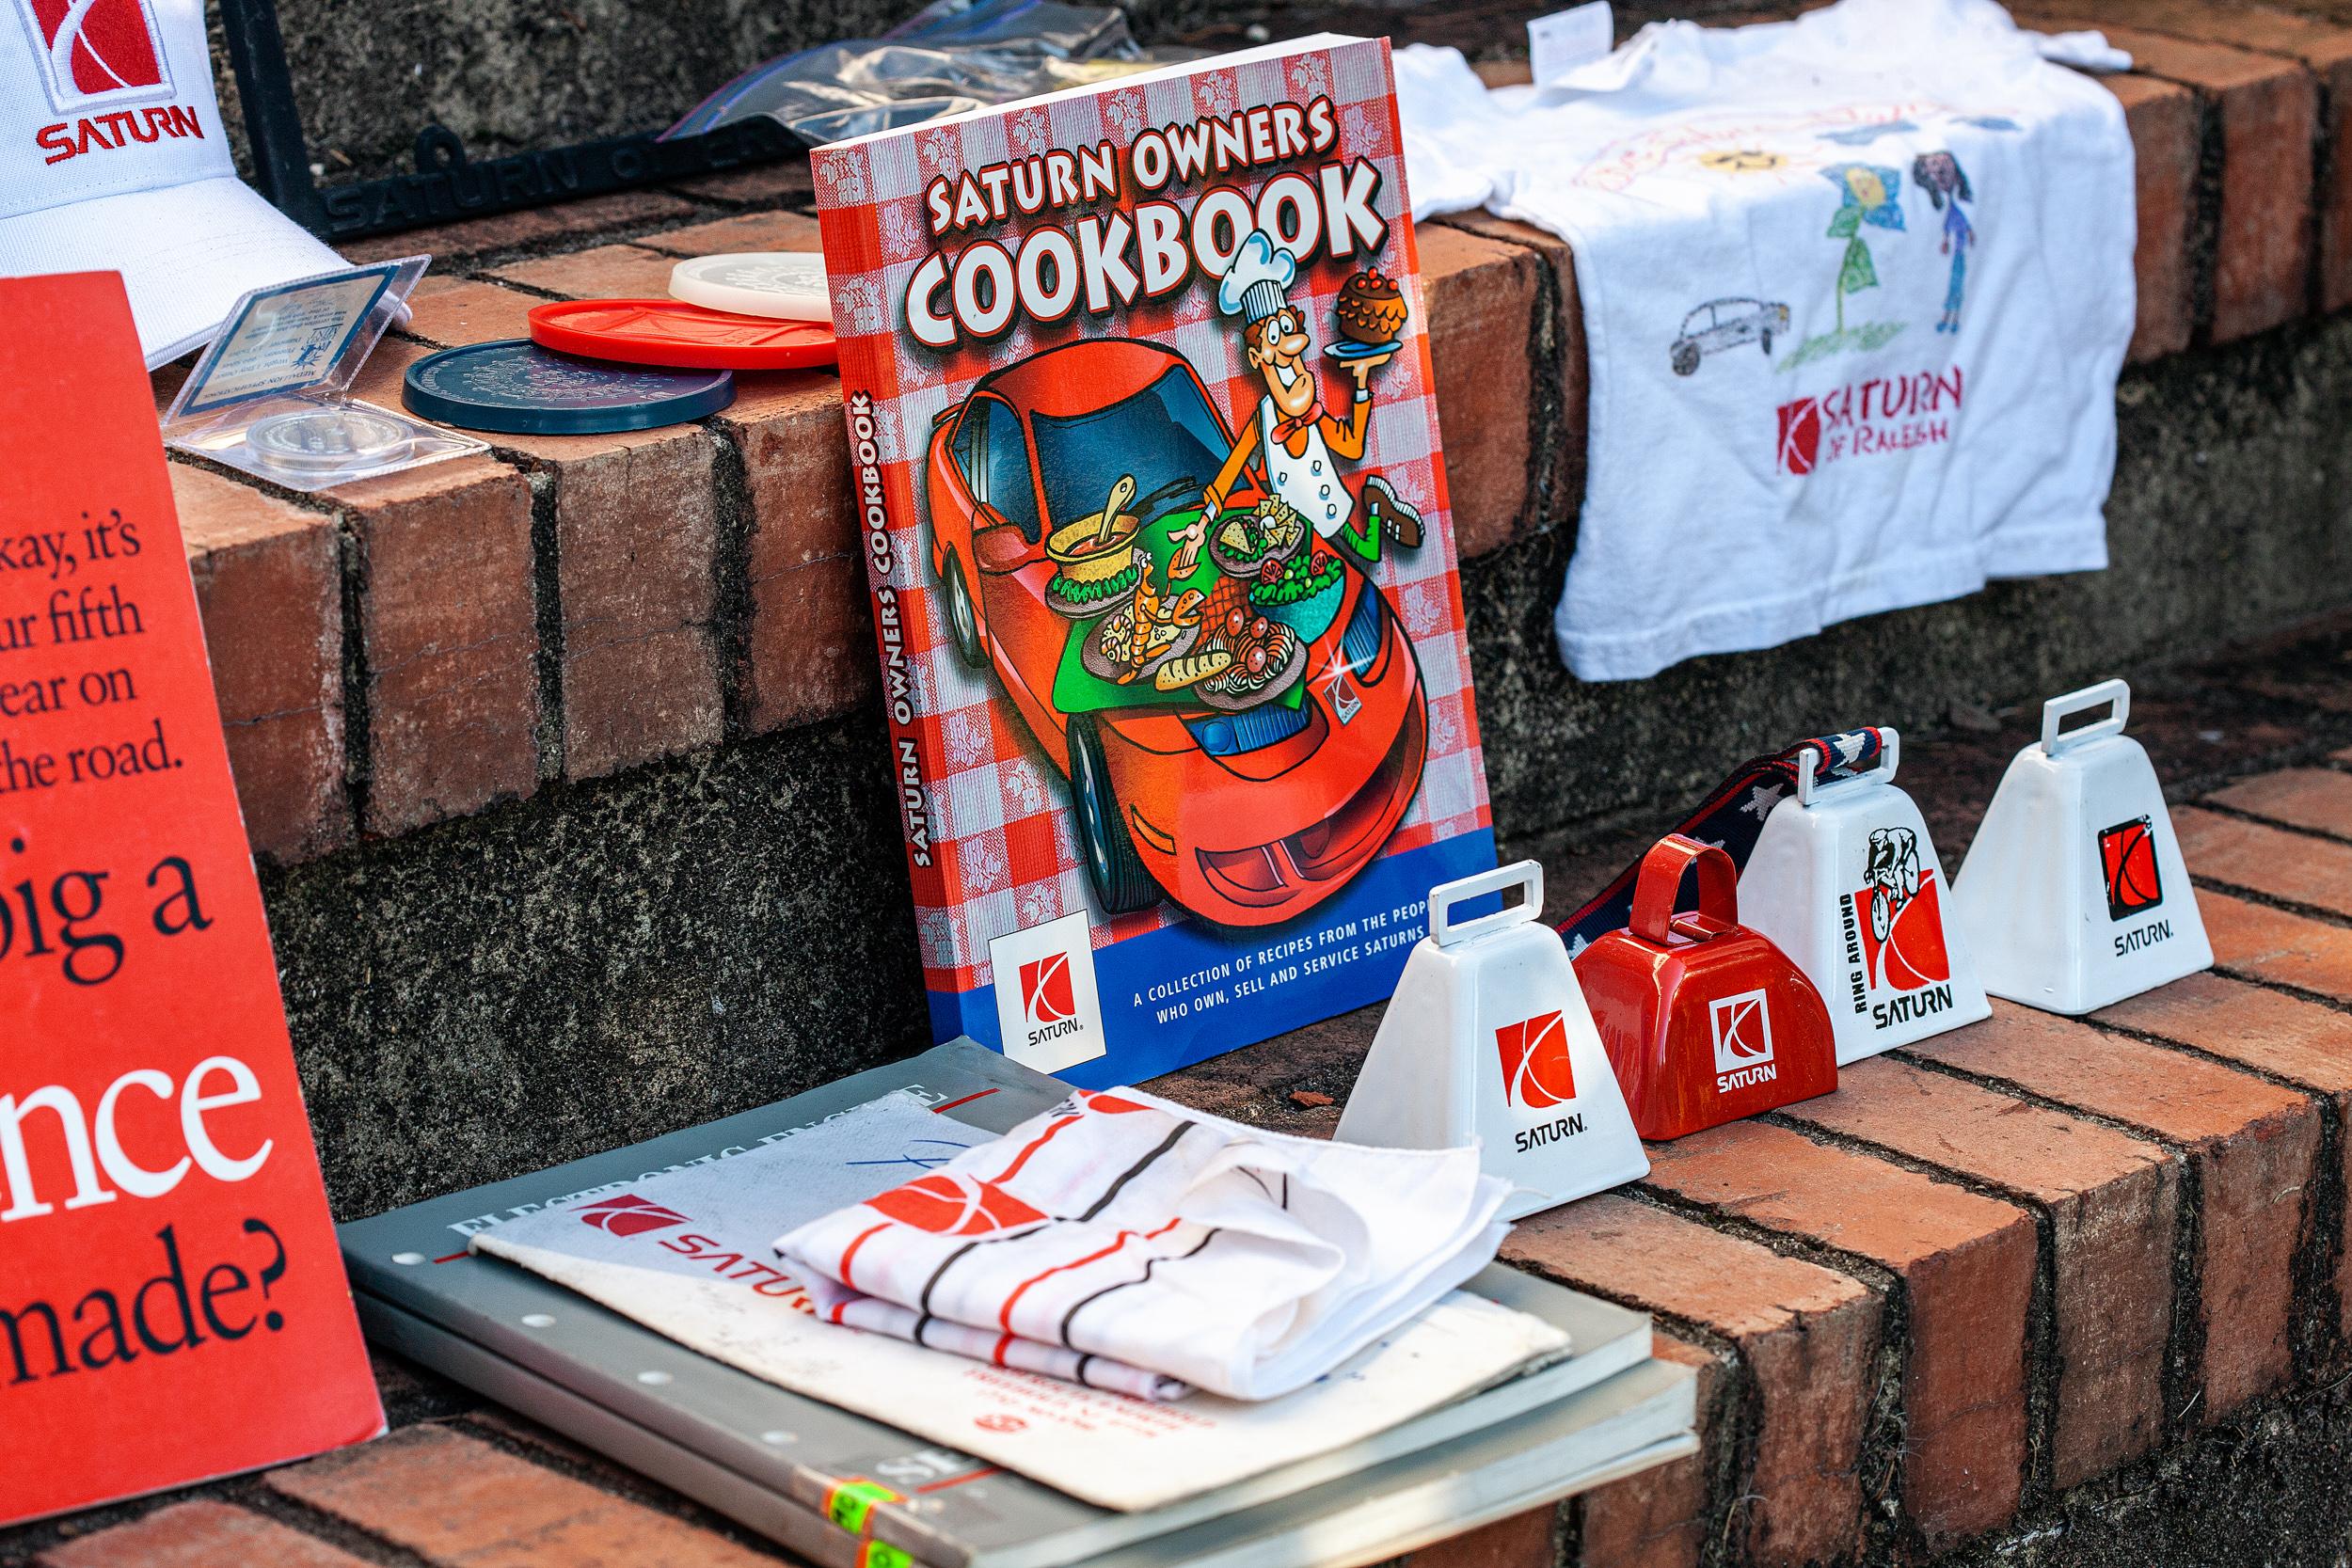 saturn owners cookbook amongst gear